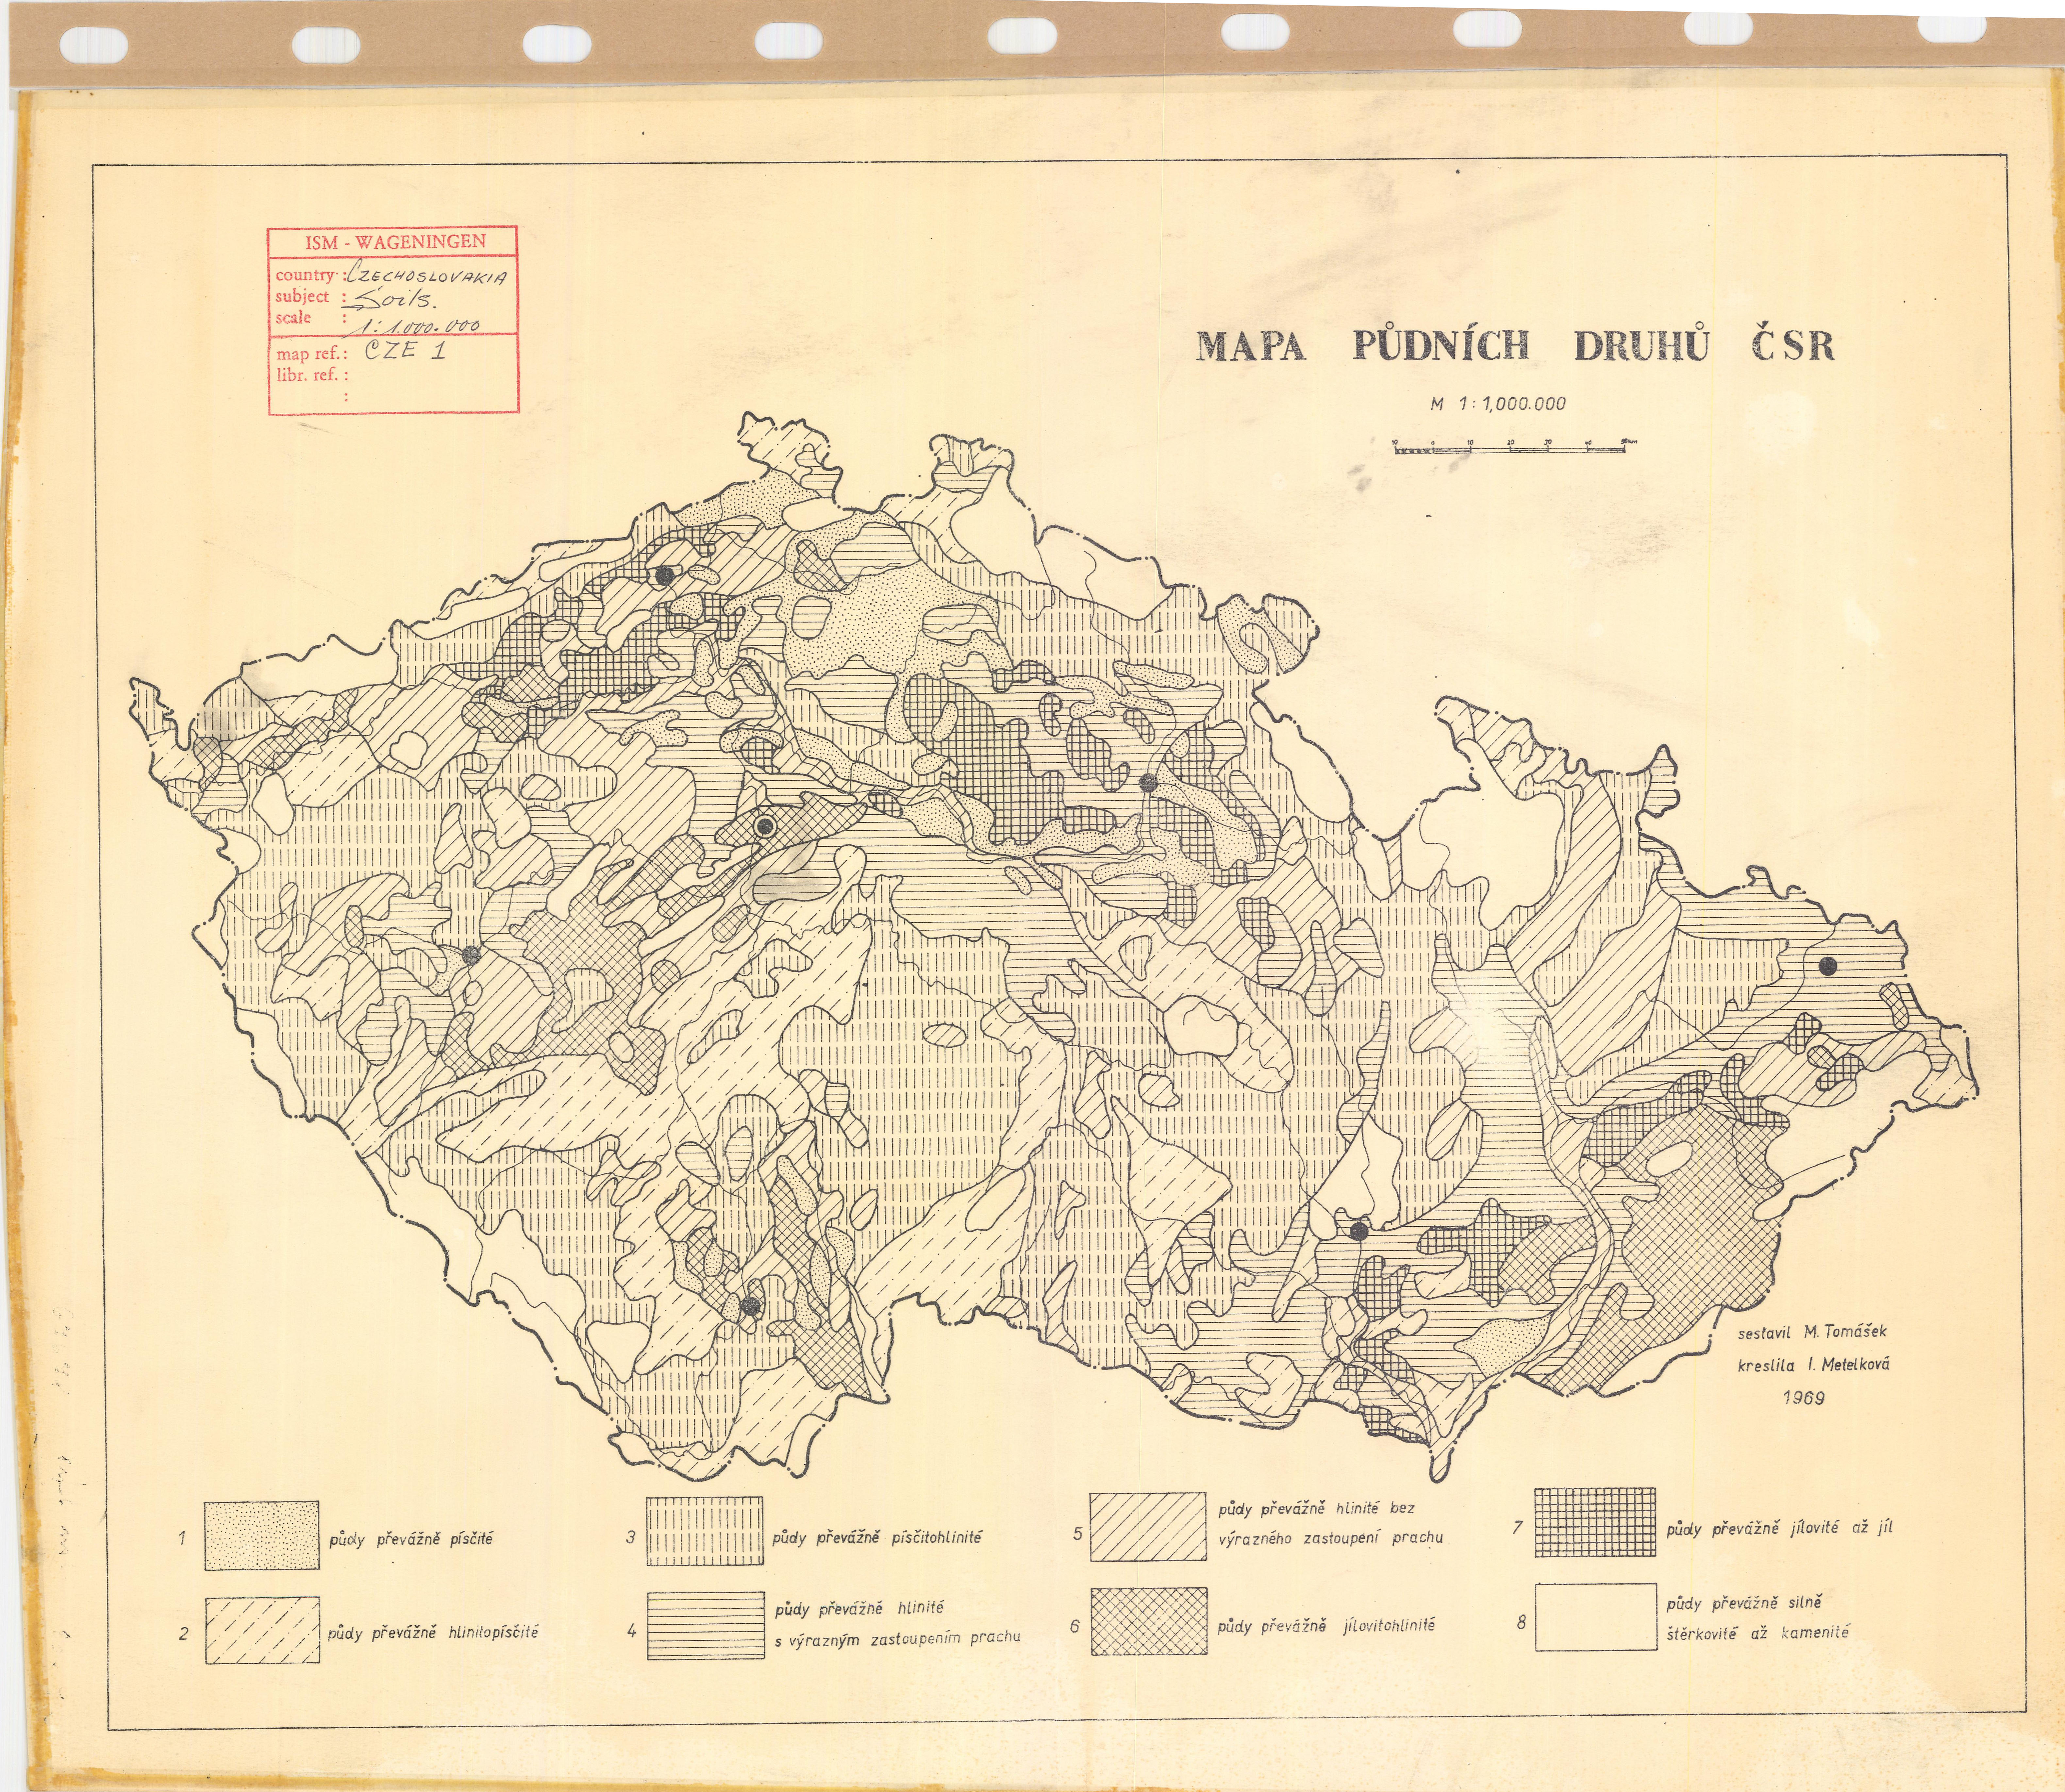 soil map Czech Republic Pudnich Druhu Csr ESDAC European